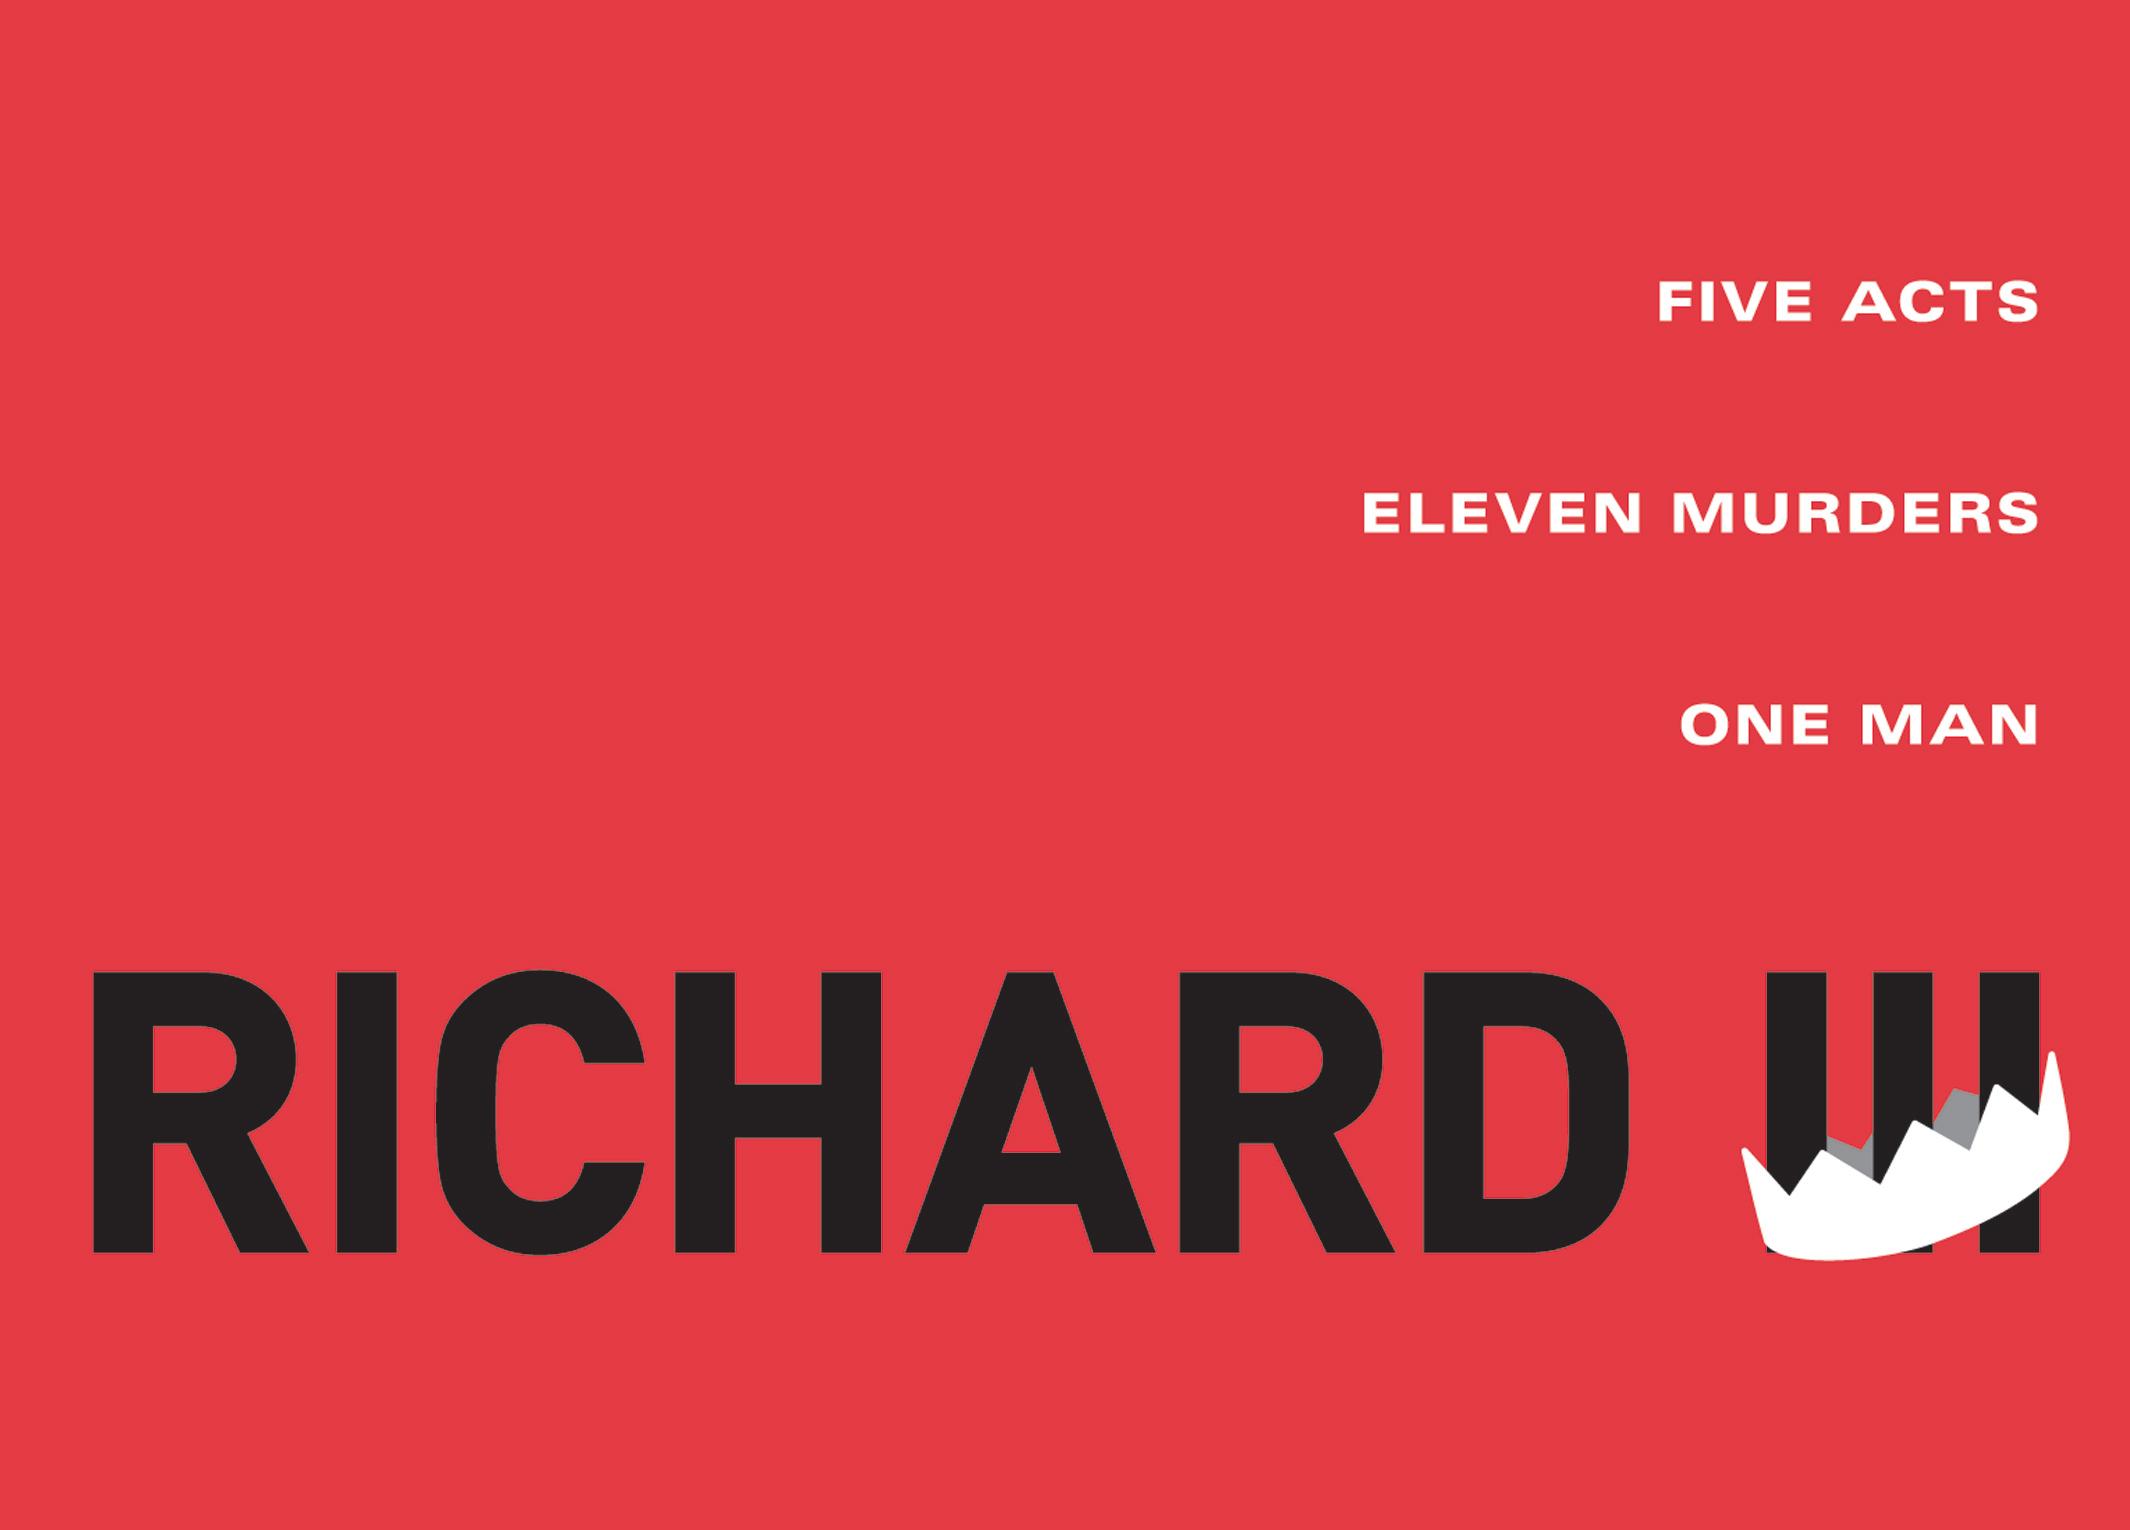 Richard-3.jpg